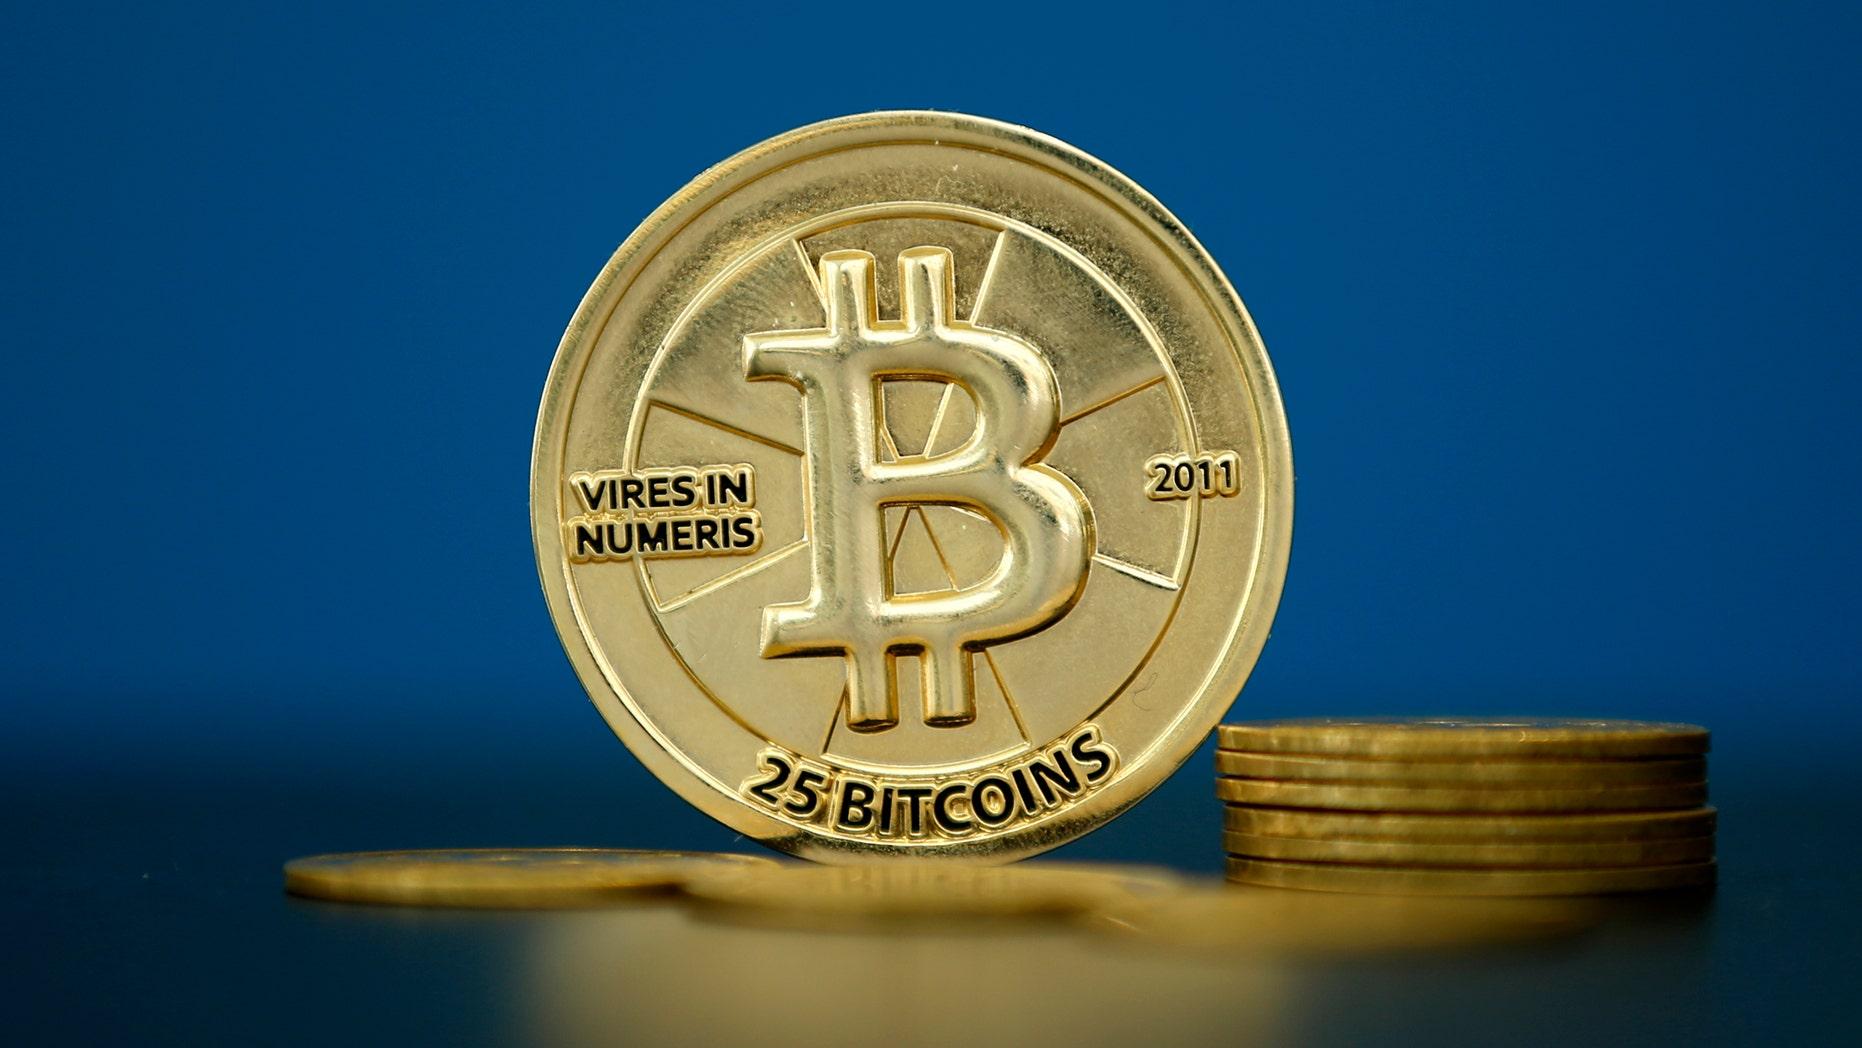 Fox news bitcoins binary options news trading ideas